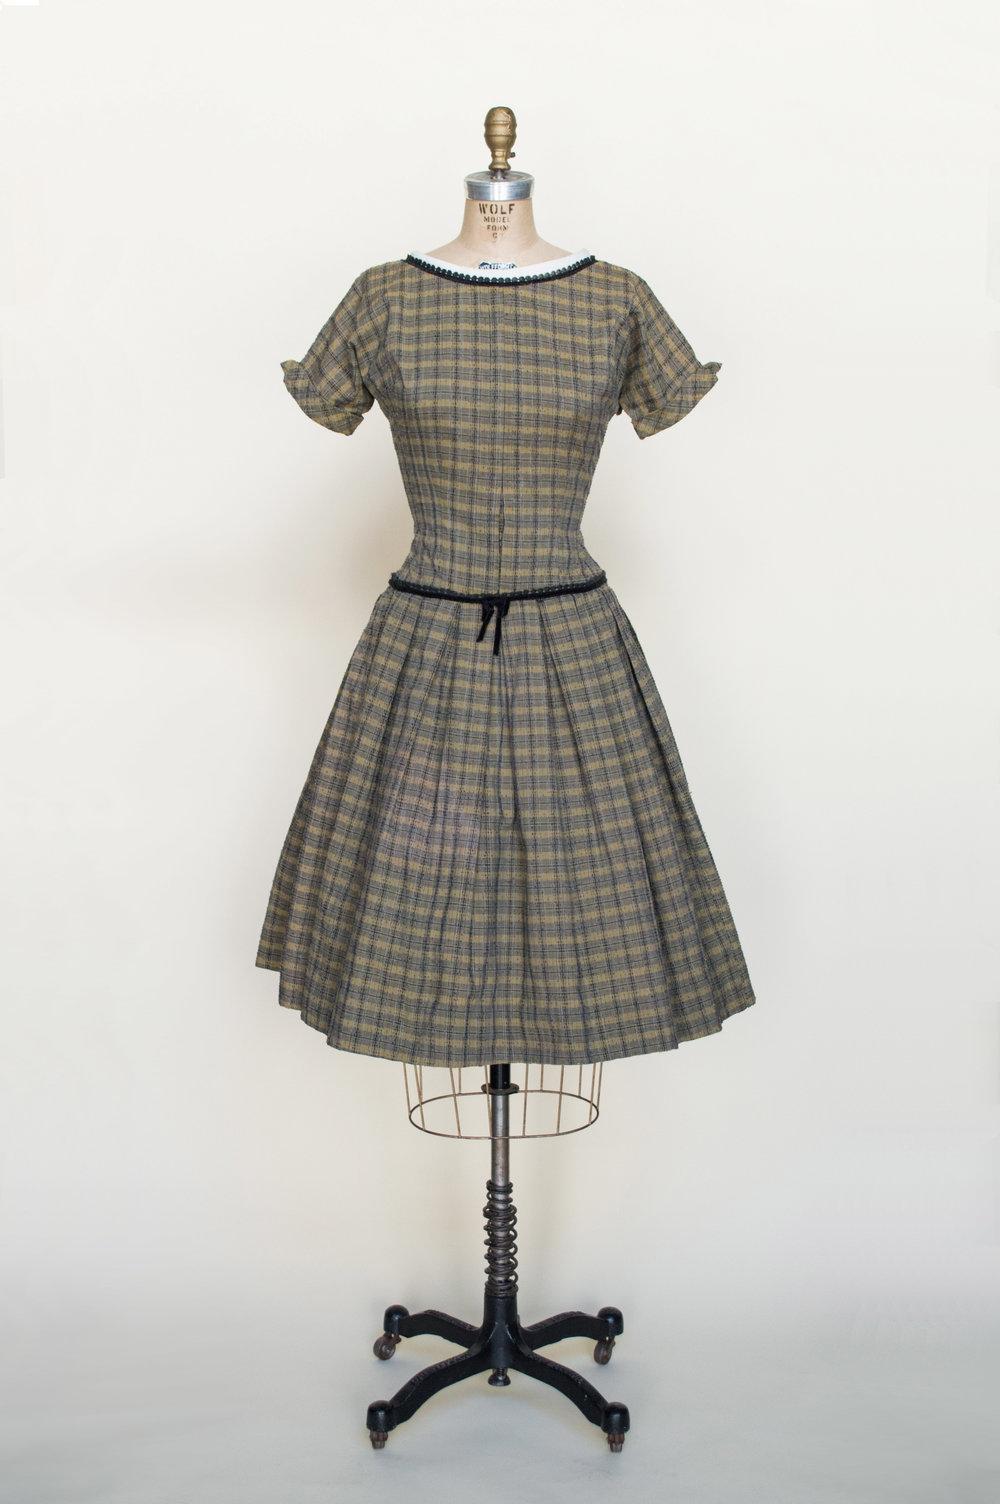 Sale — Vintage Clothing Store Online | Austin Texas | Dalena Vintage